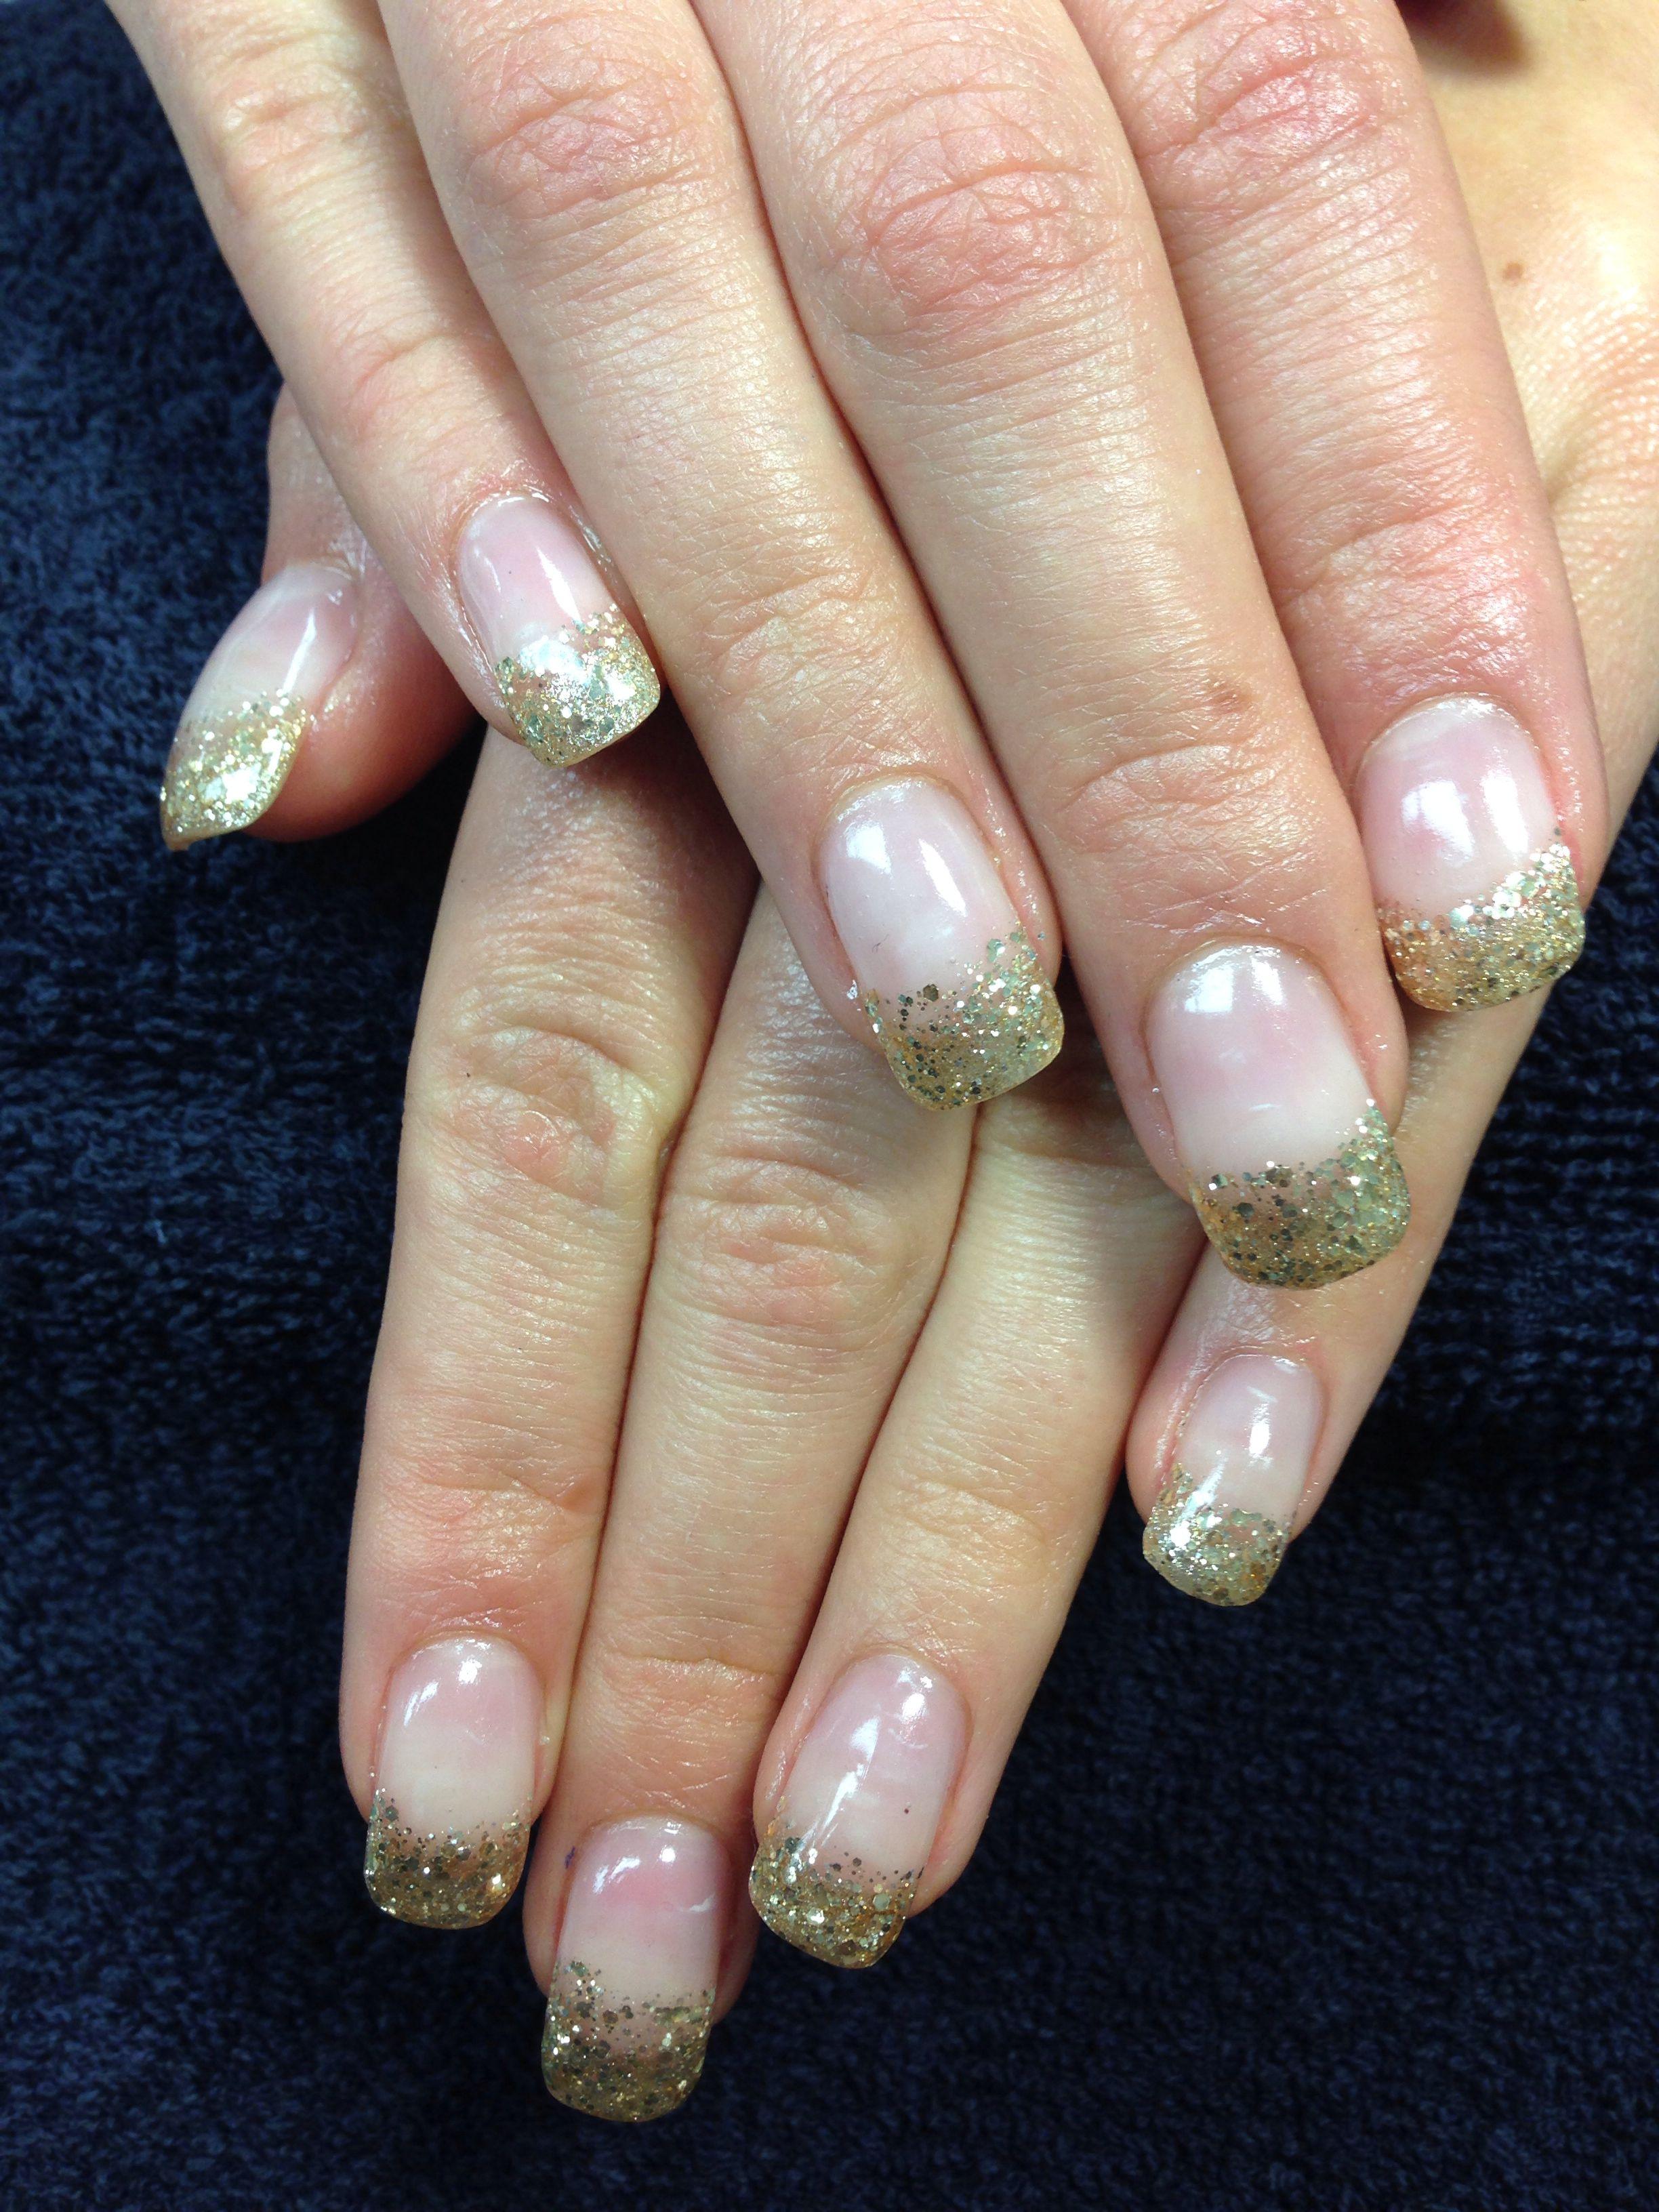 Katie\'s nails. Golden gel nail art.   Nails I\'ve done   Pinterest ...